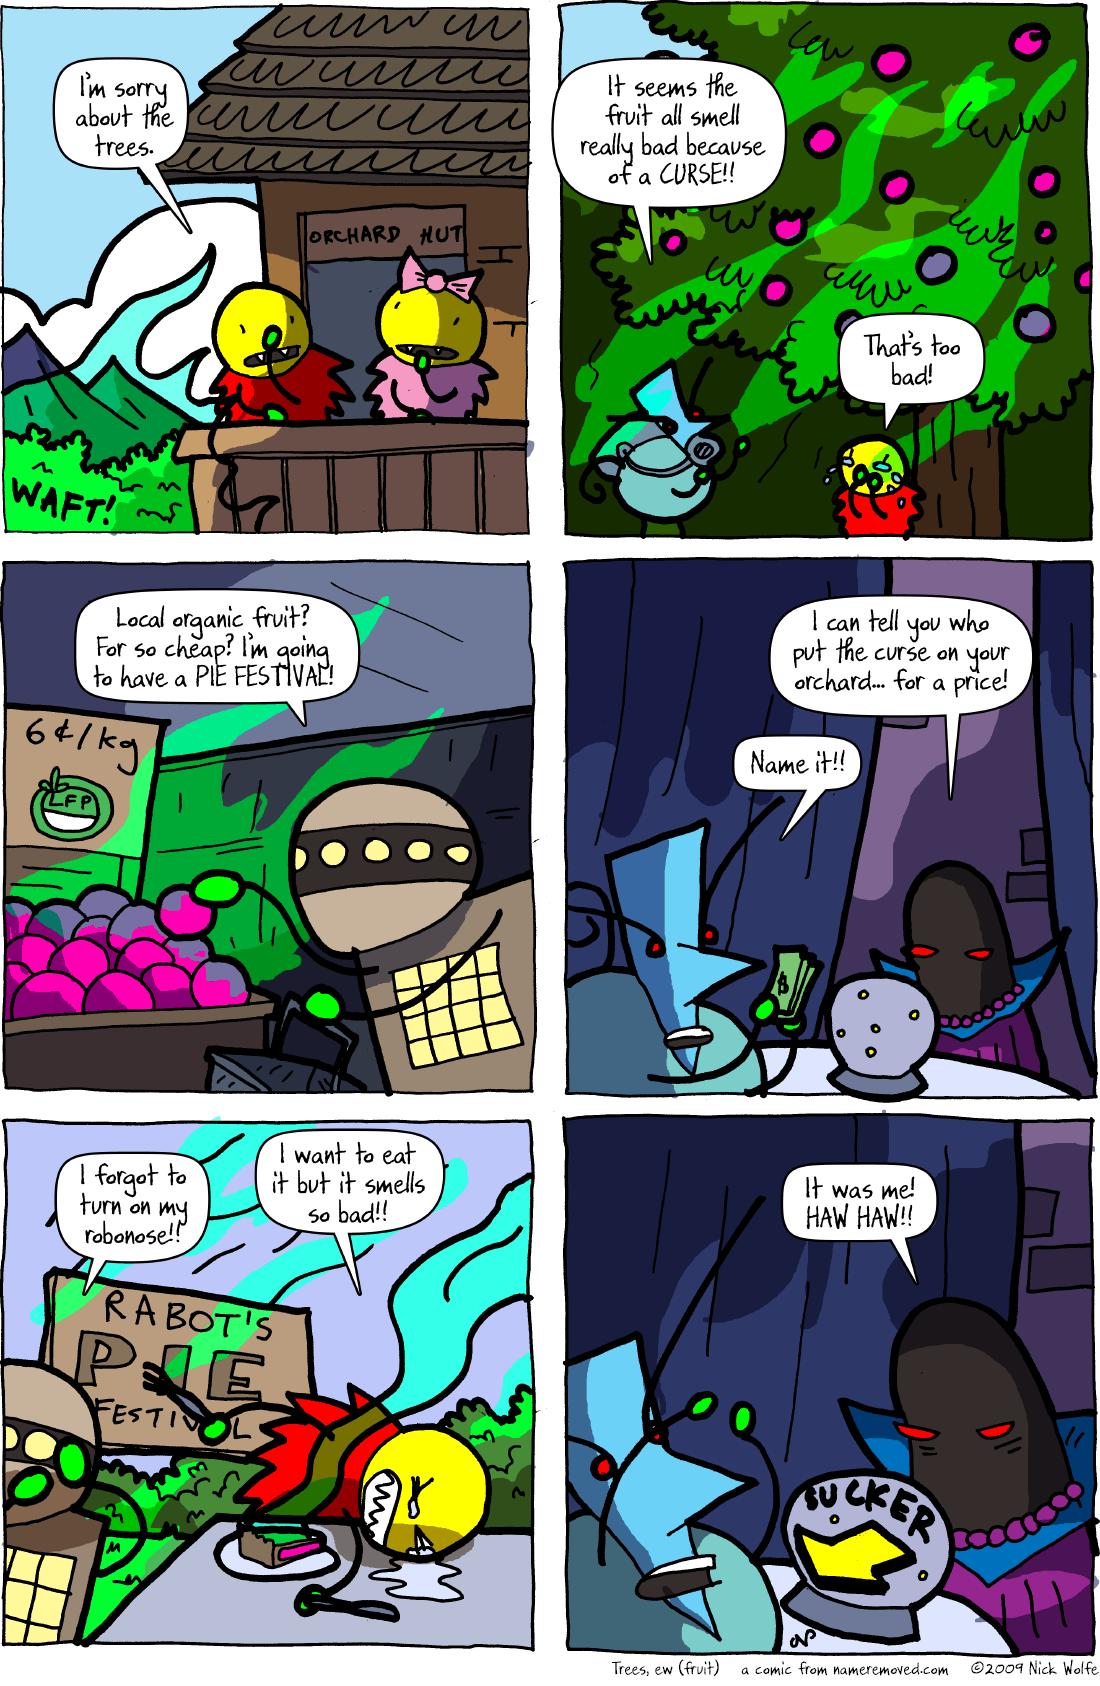 Trees, ew (fruit)